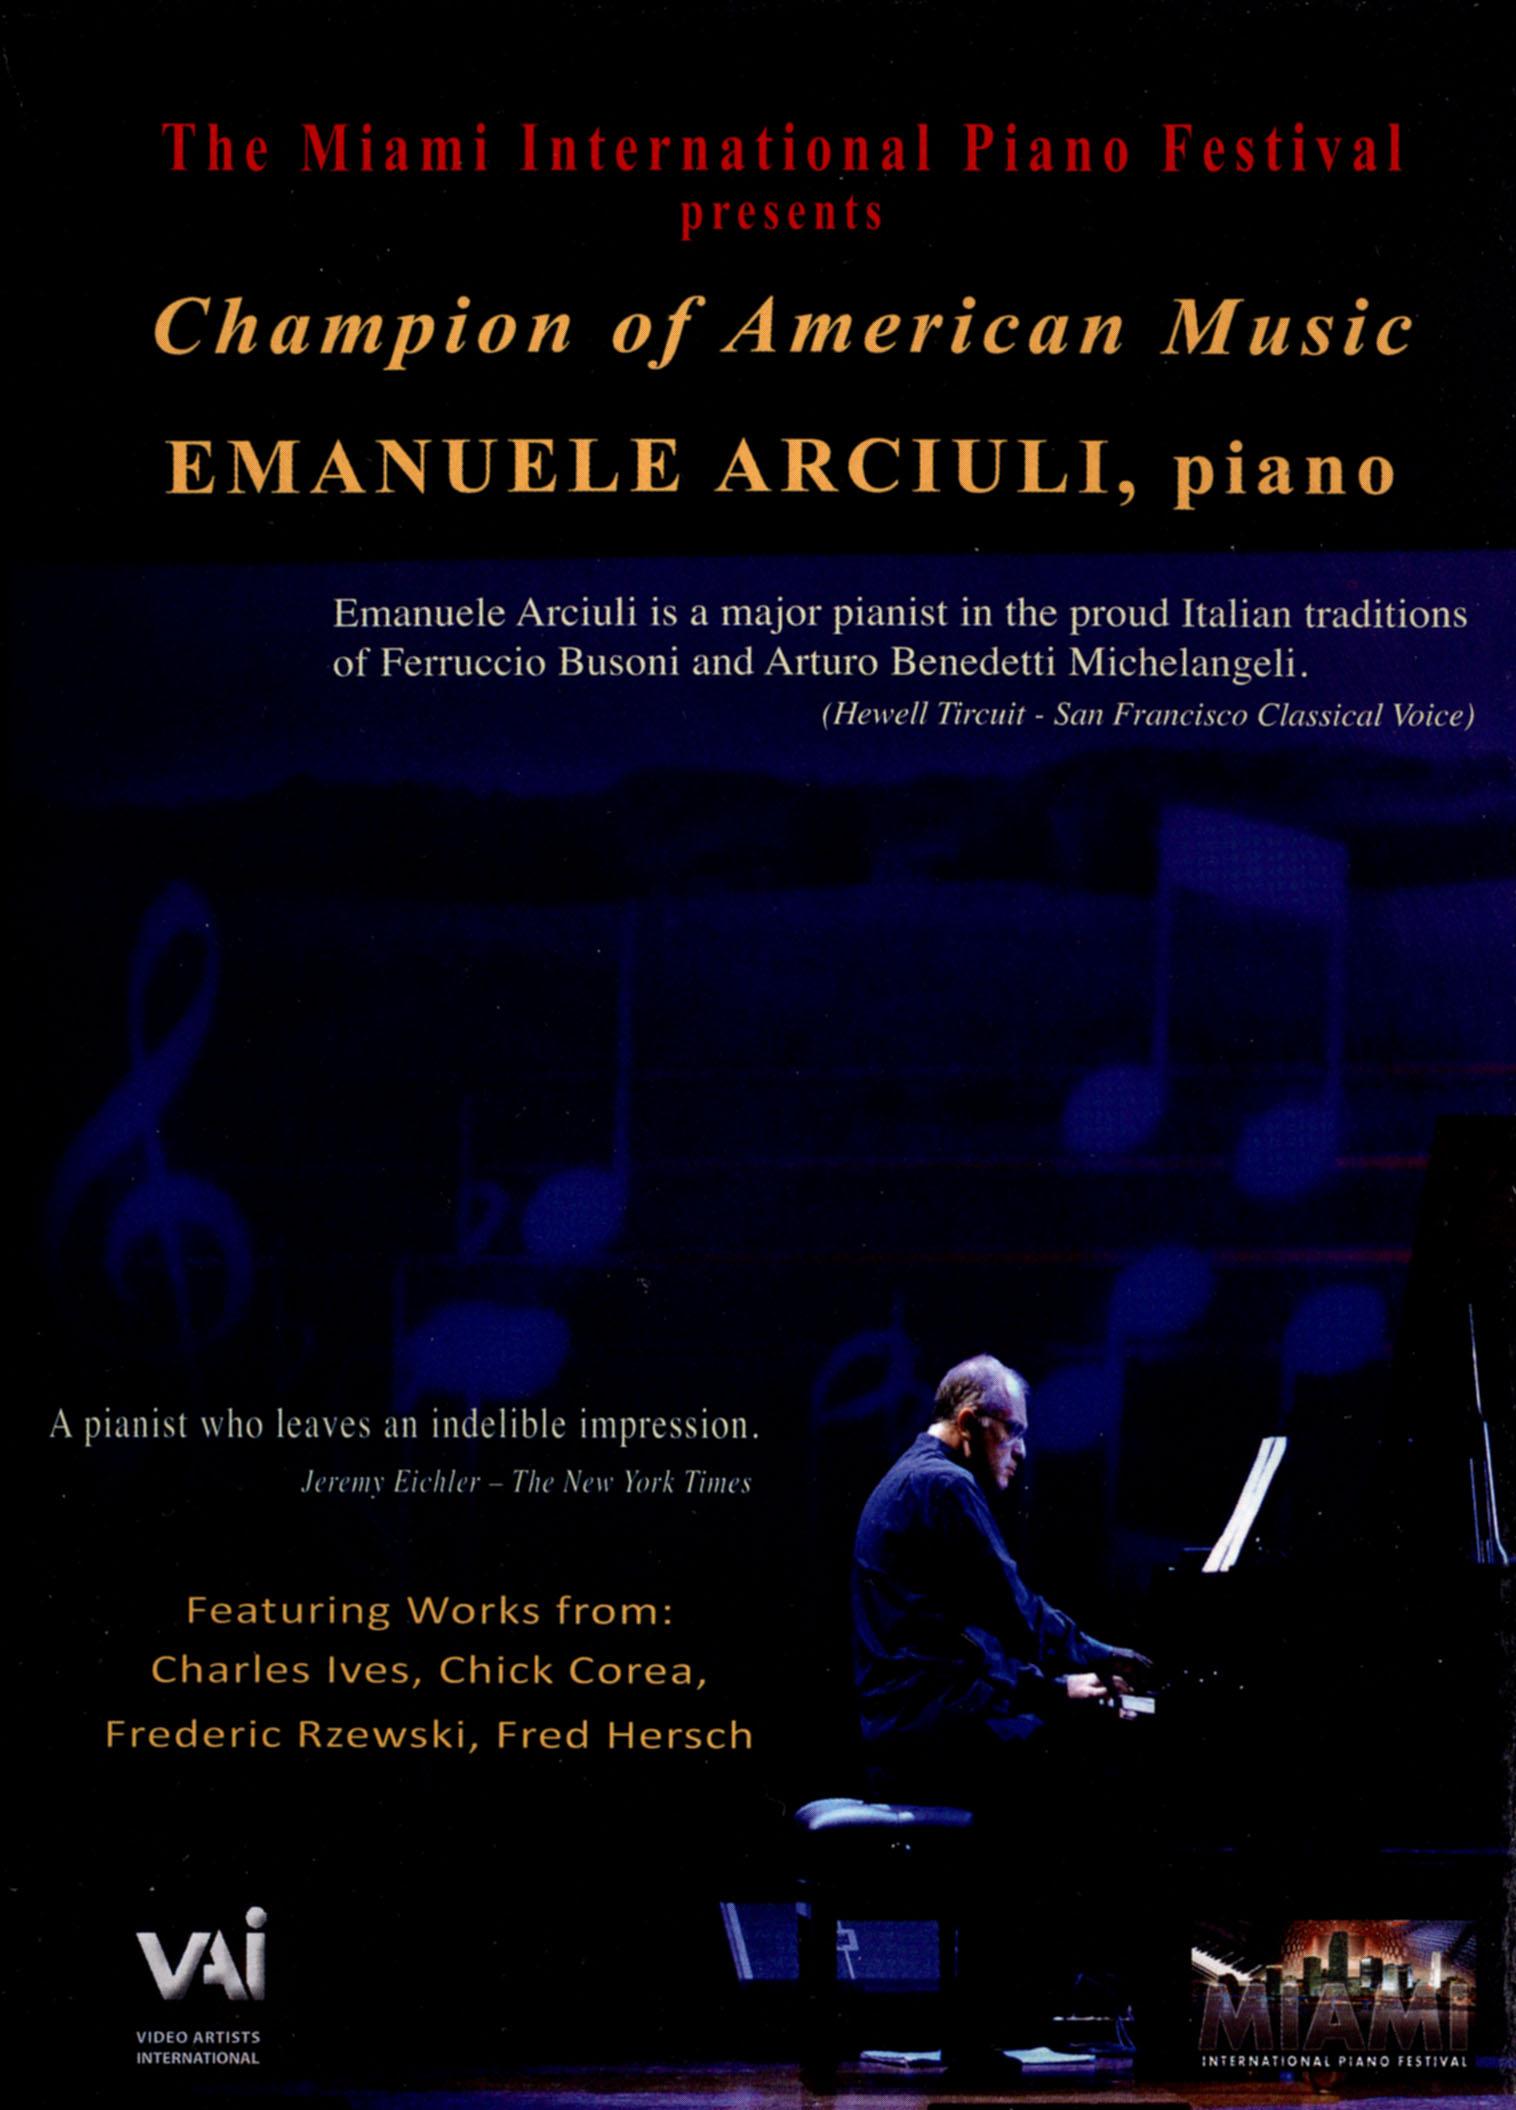 Emanuele Arciuli: Champion of American Music